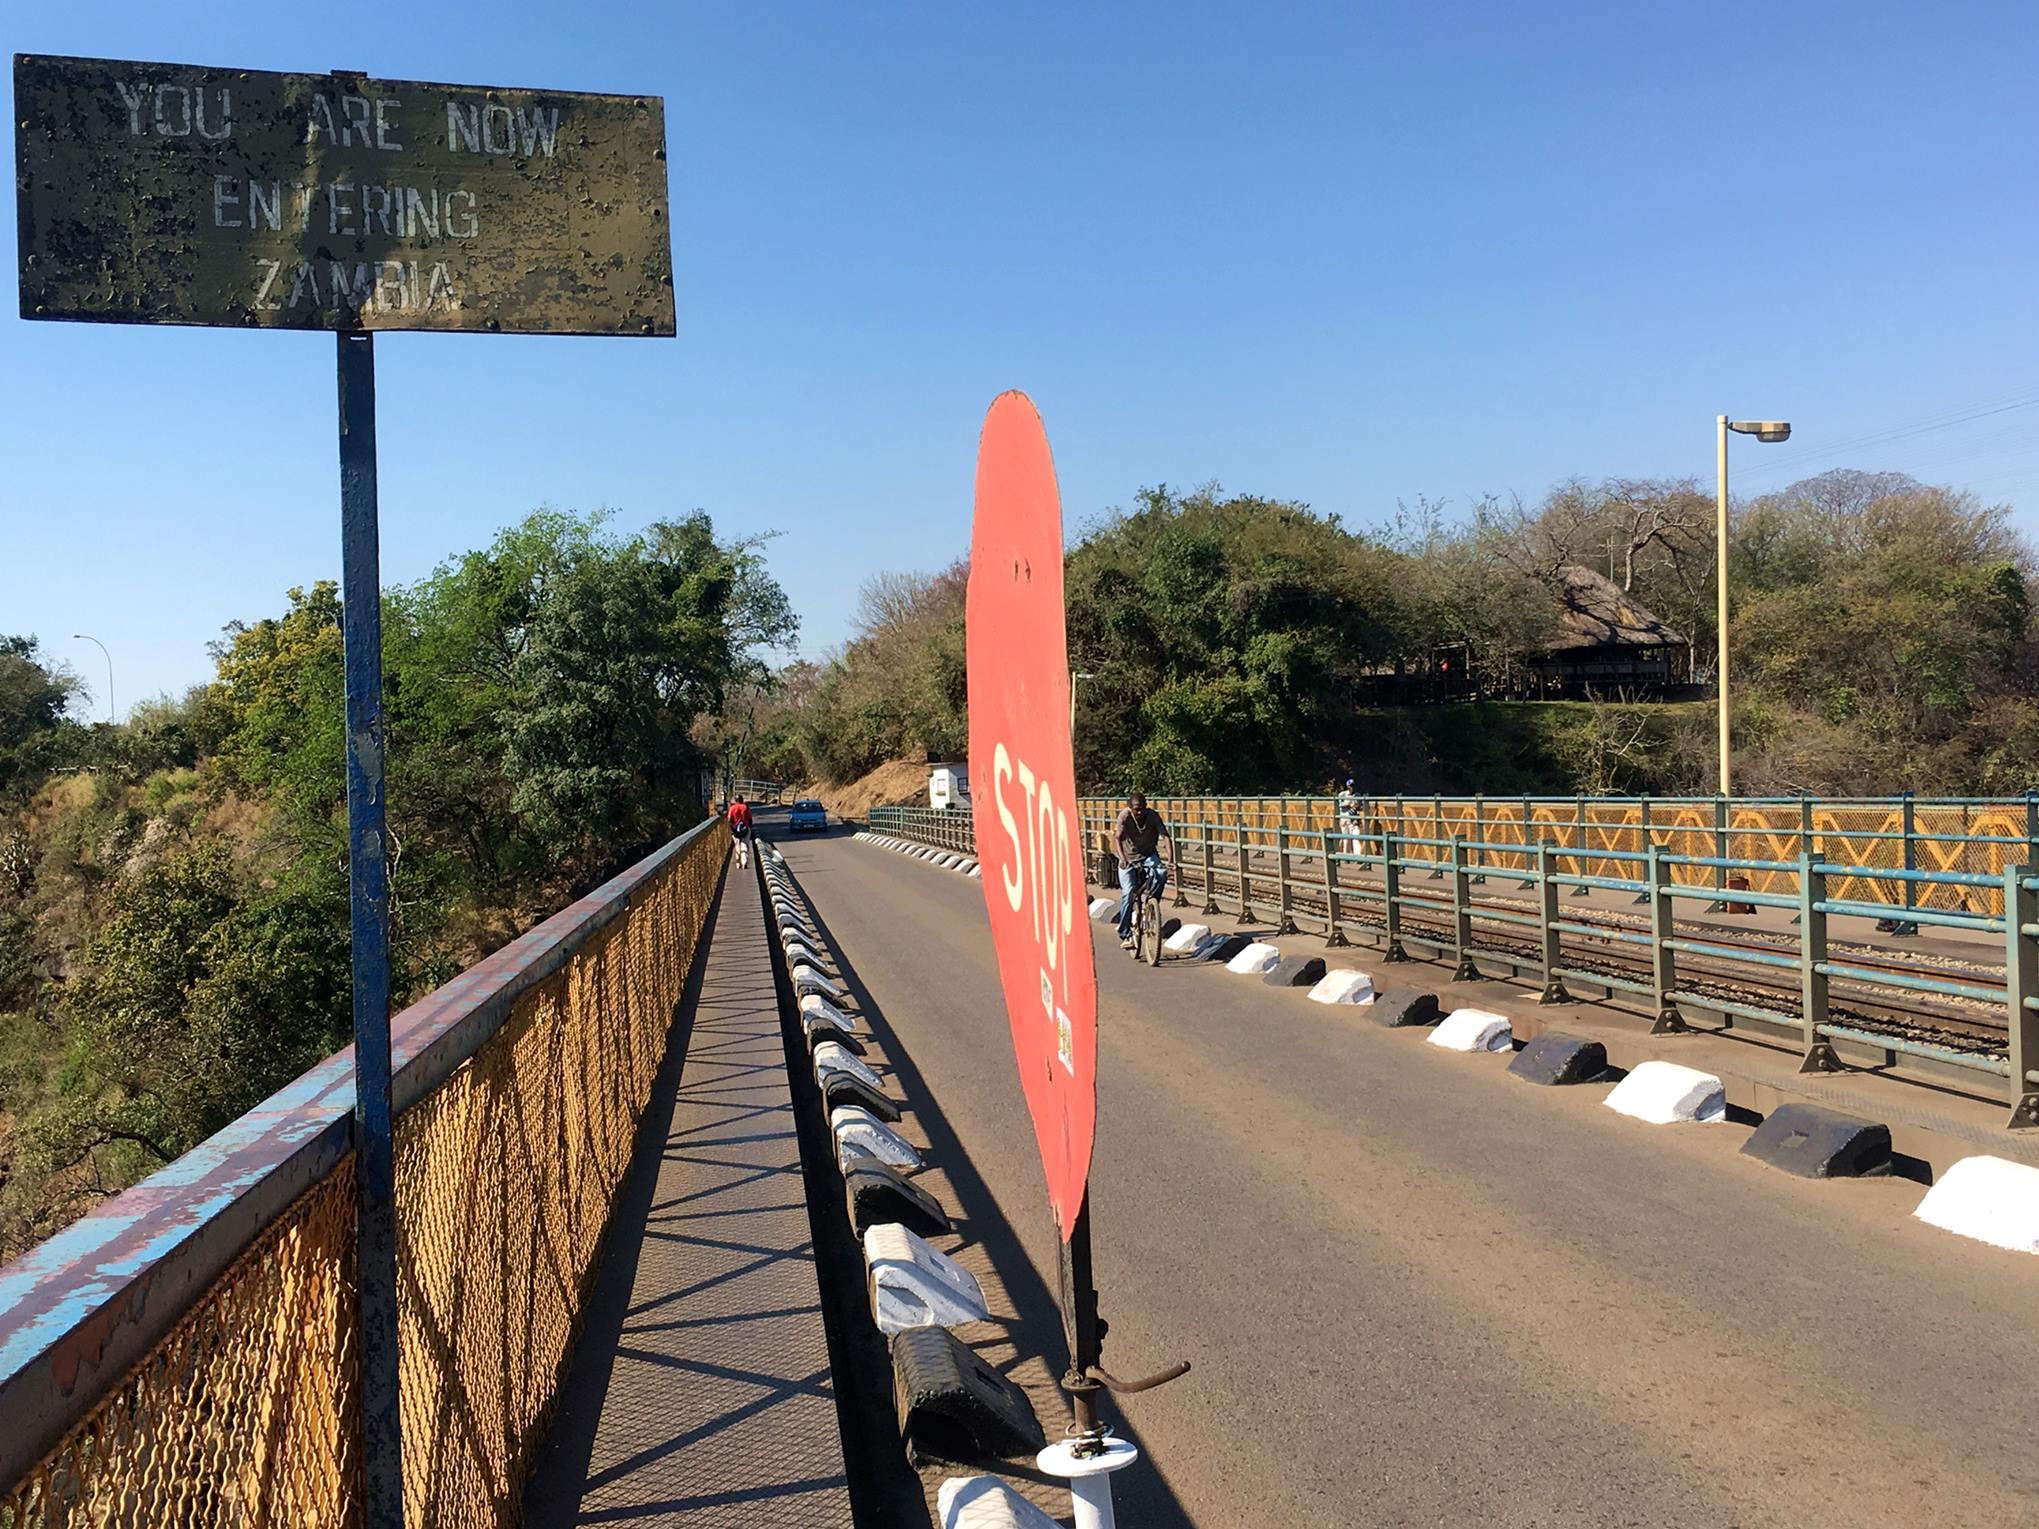 victoriafalls_zimbabue_zambia_ponte